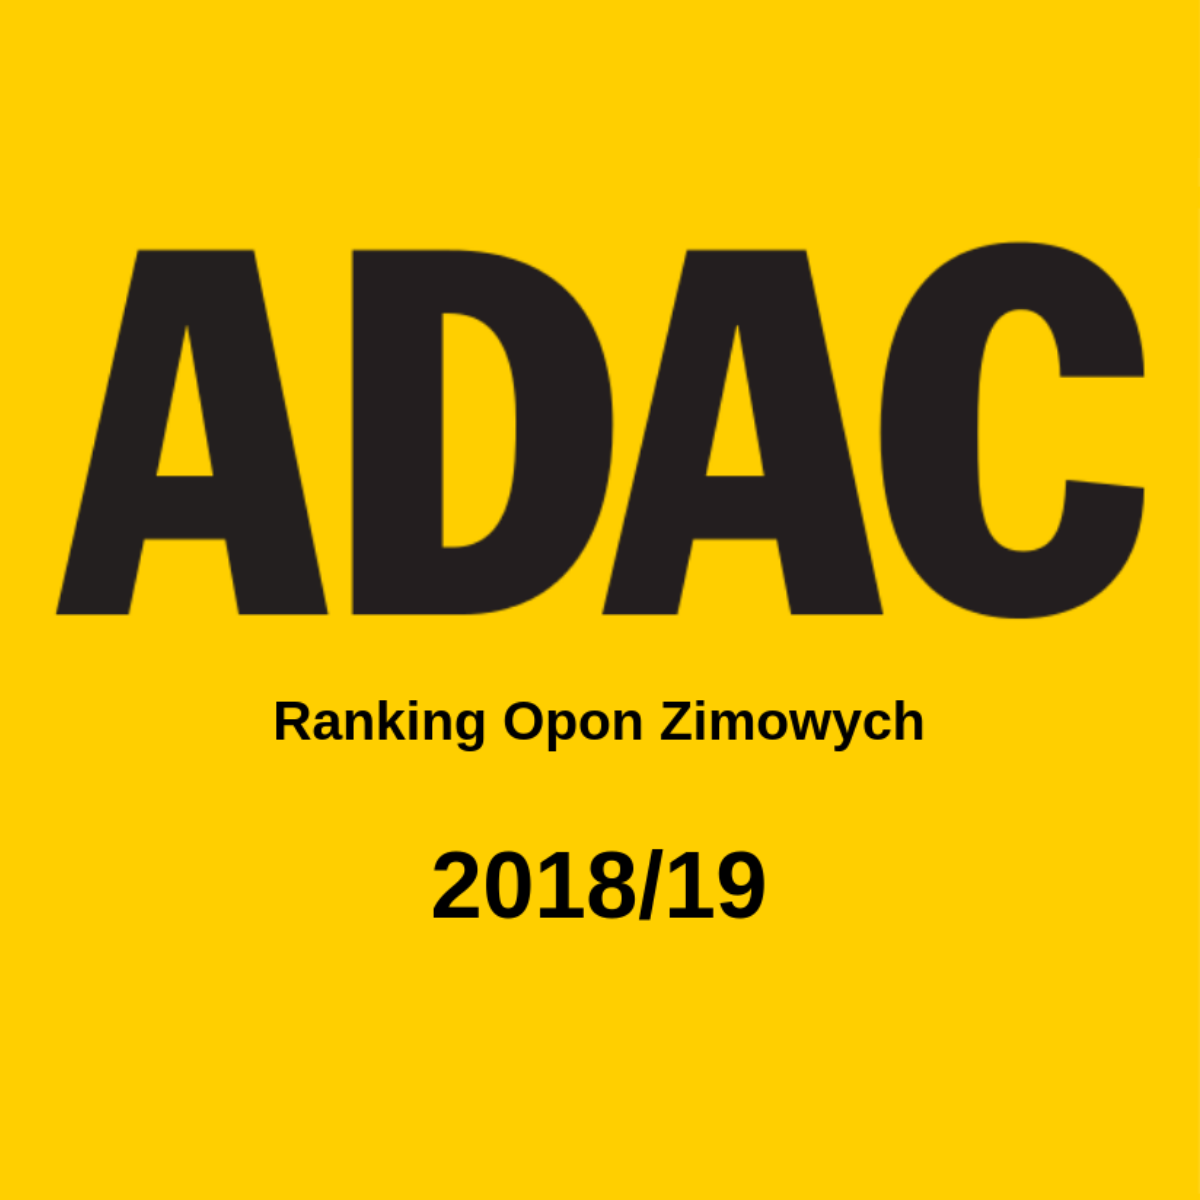 Opony Zimowe Adac Ranking 201819 Worldmasterpl